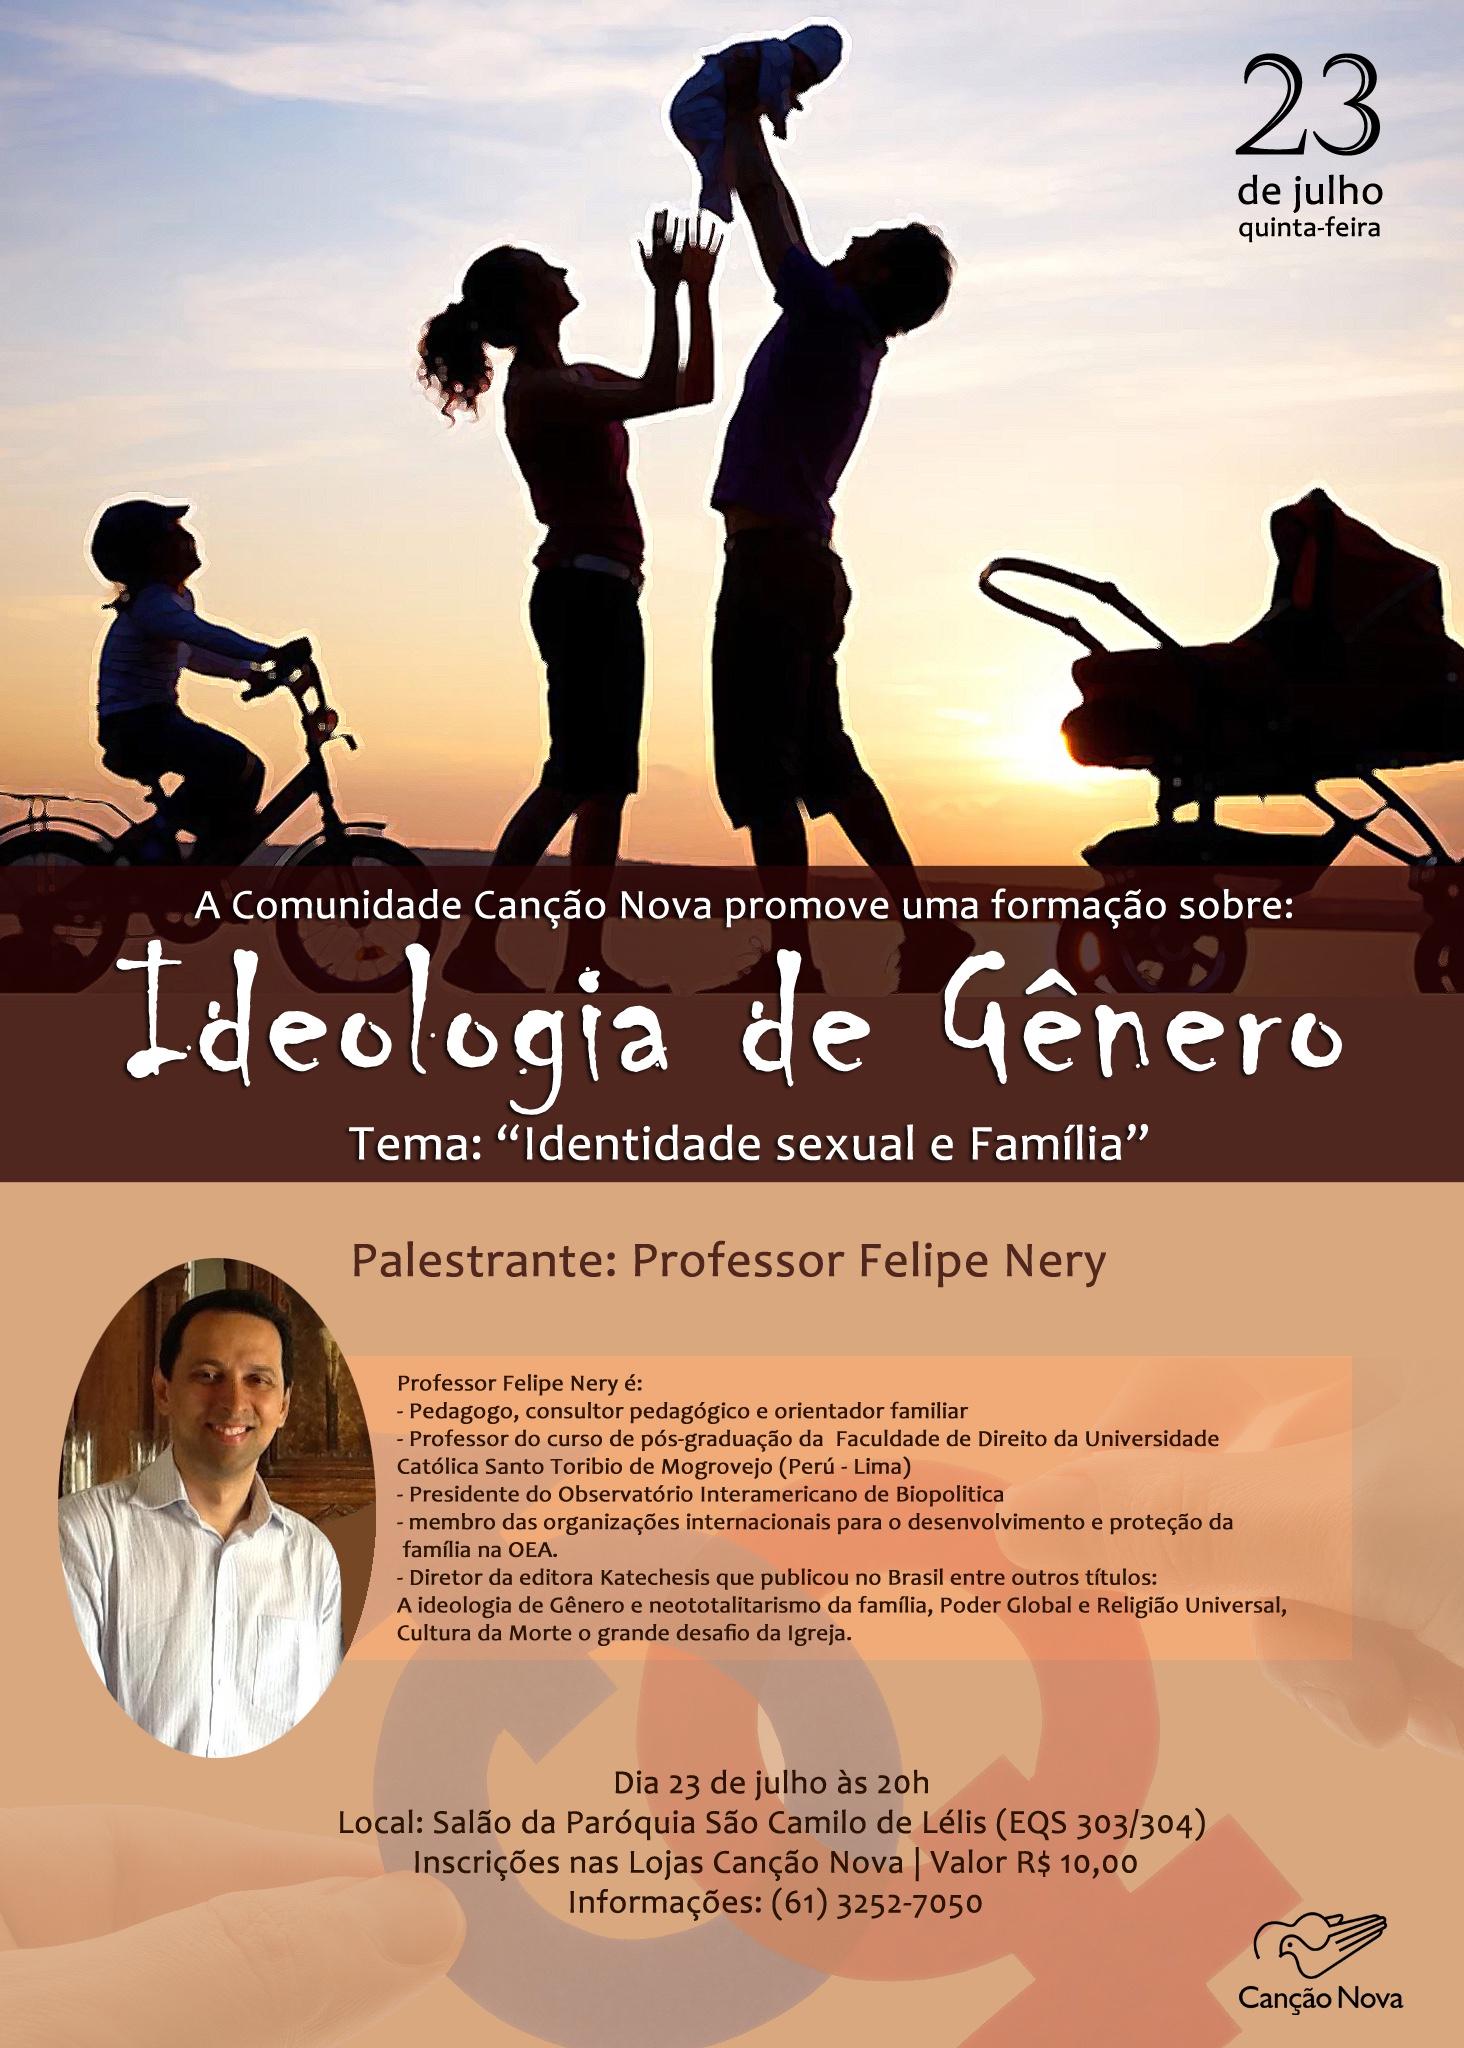 IdeologiadeGenero